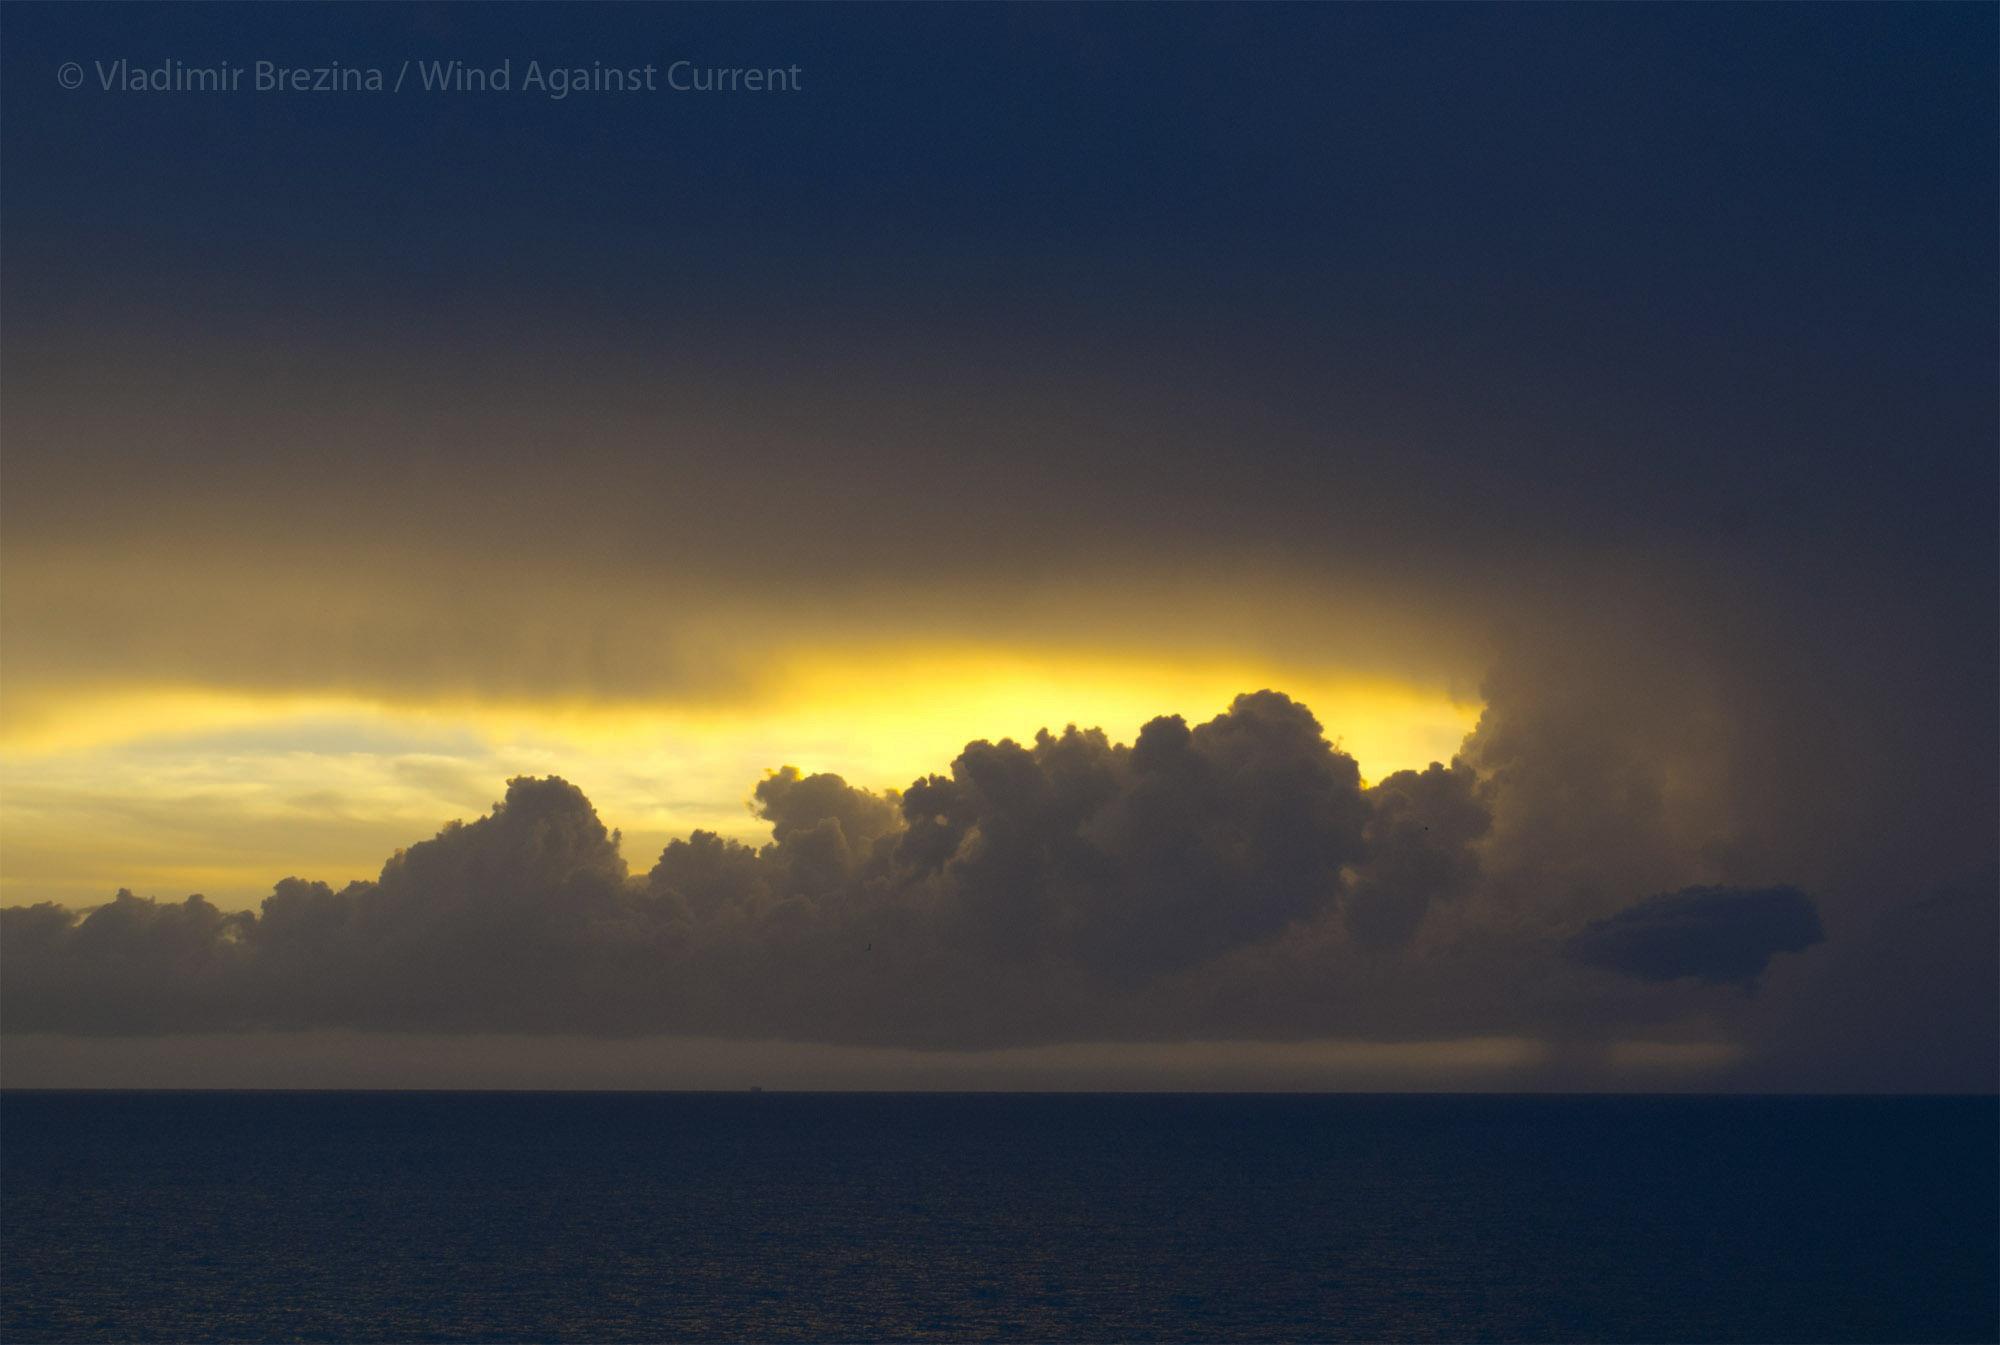 Seen from st pete beach florida august 2013